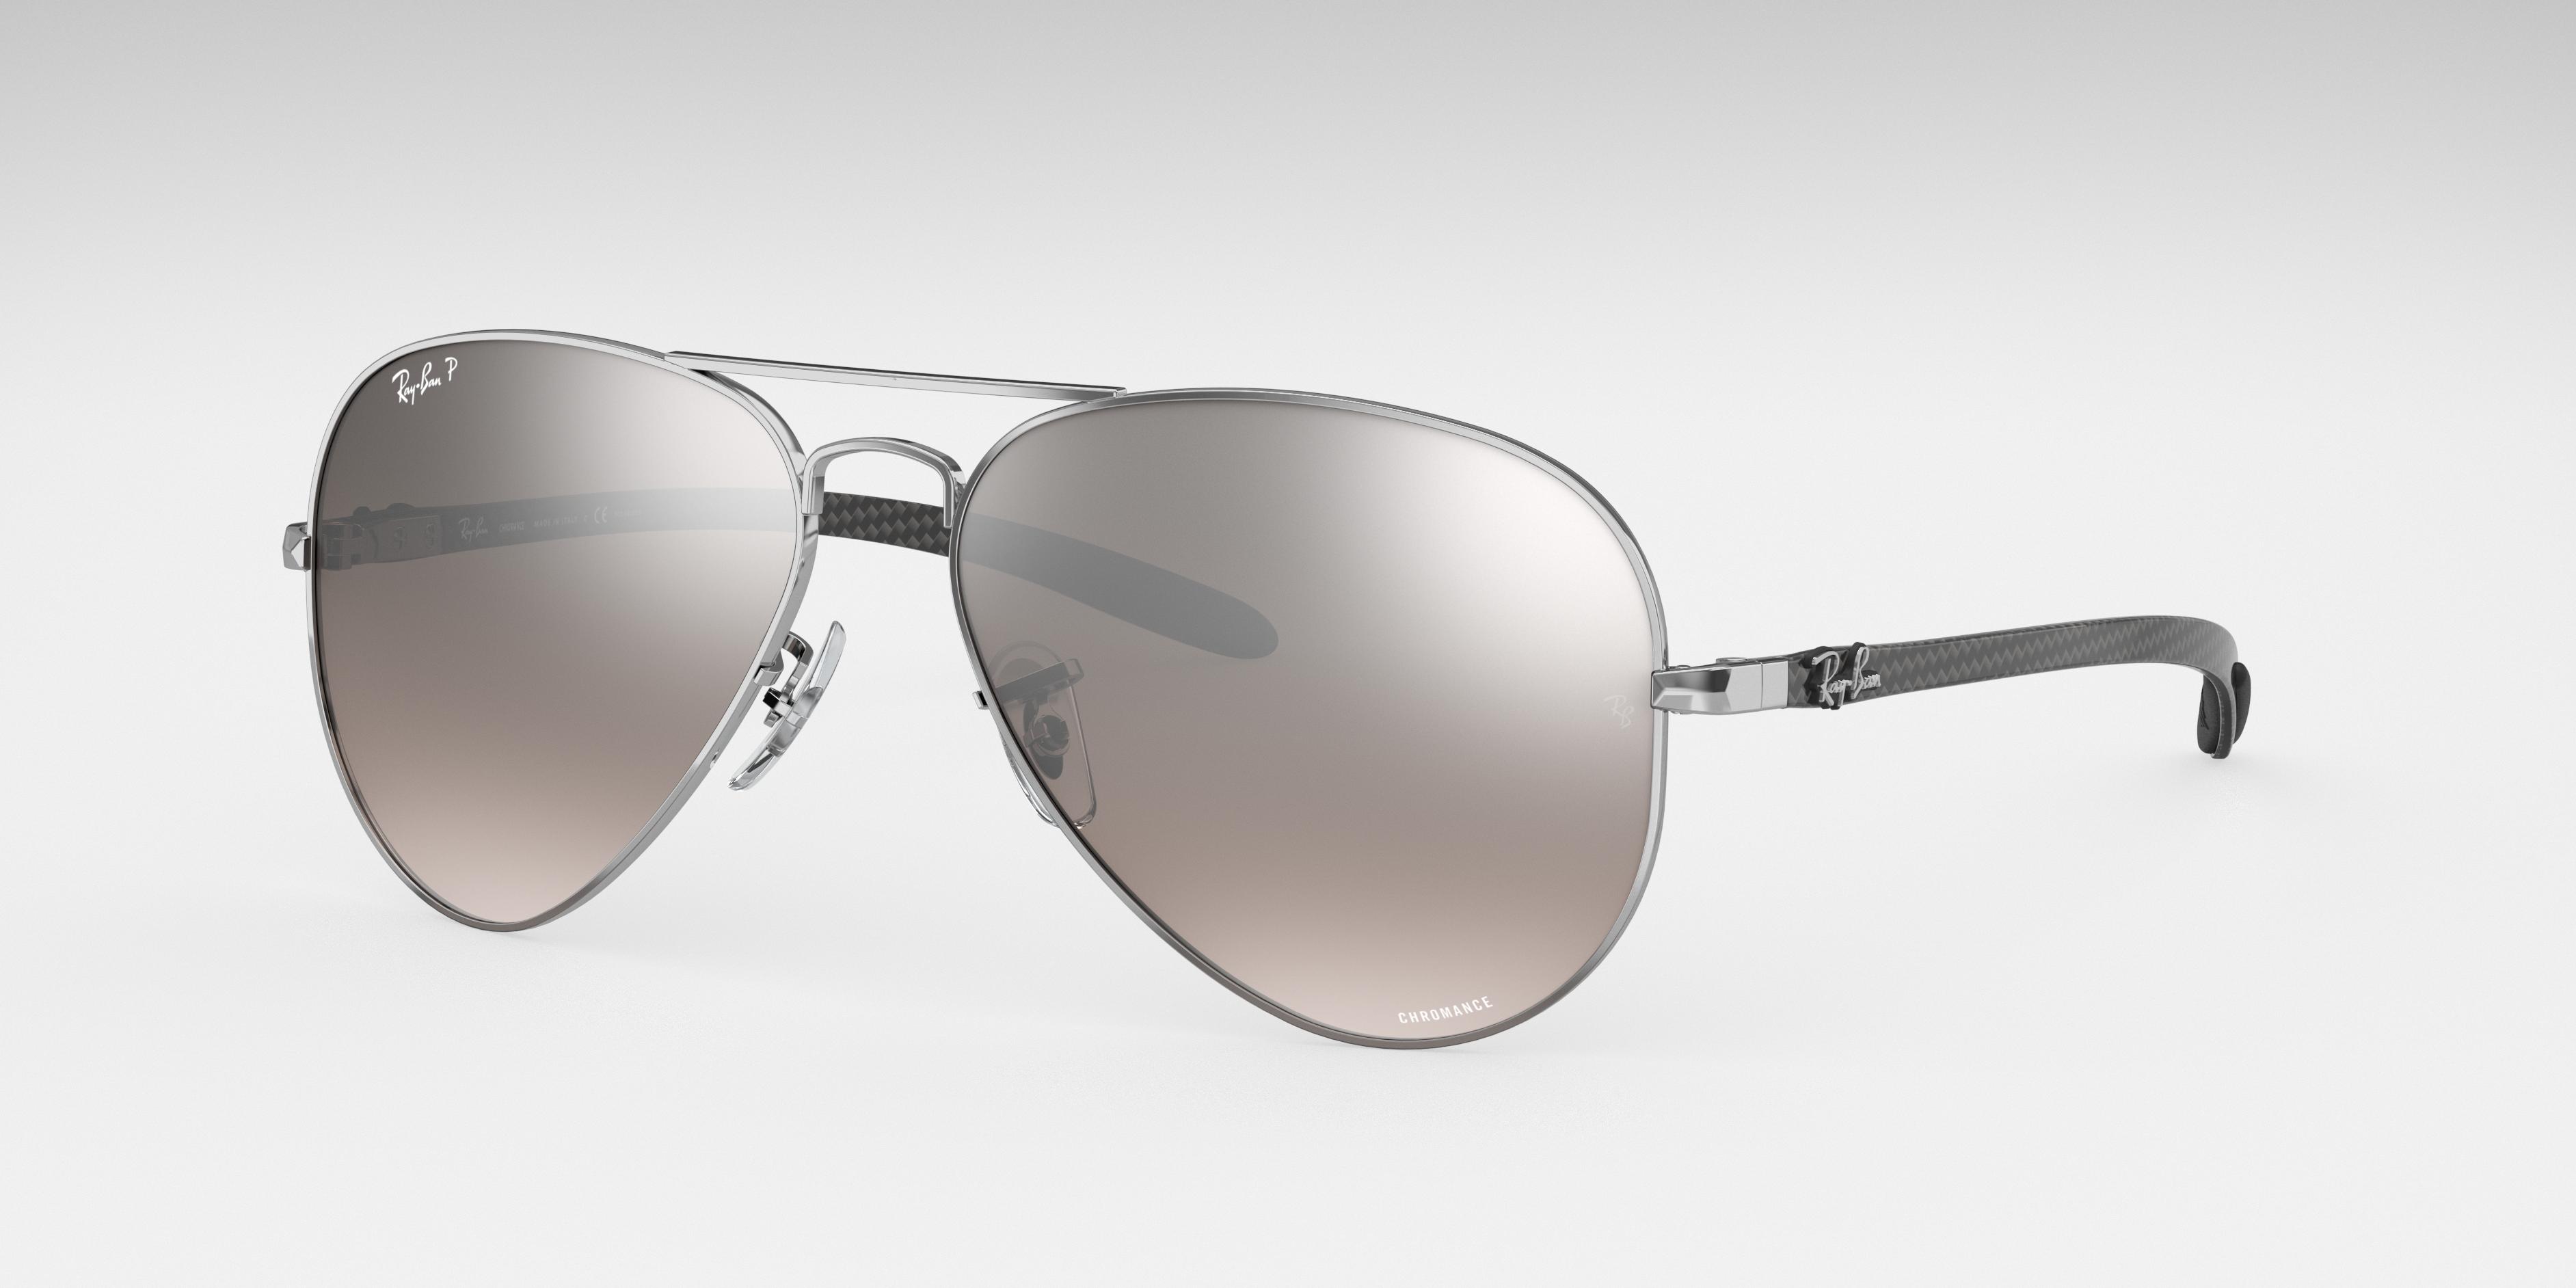 Ray-Ban Rb8317 Chromance Silver, Polarized Gray Lenses - RB8317CH